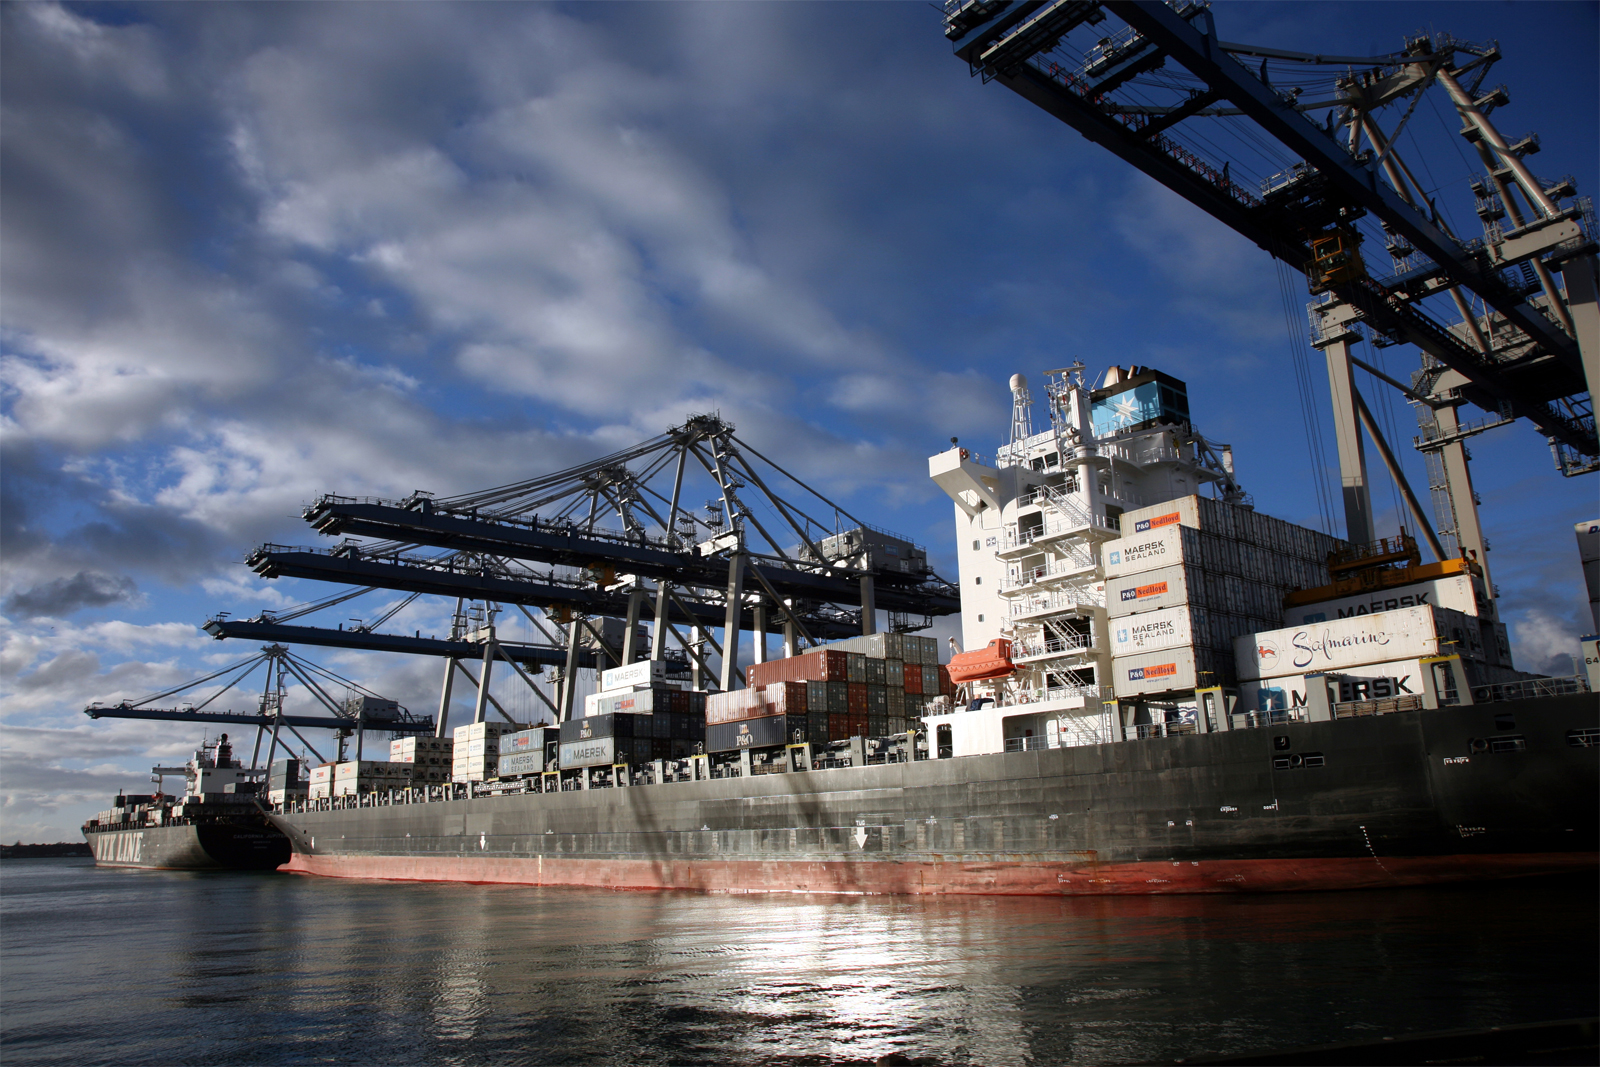 Al Refai International Transport & Clearing Co.